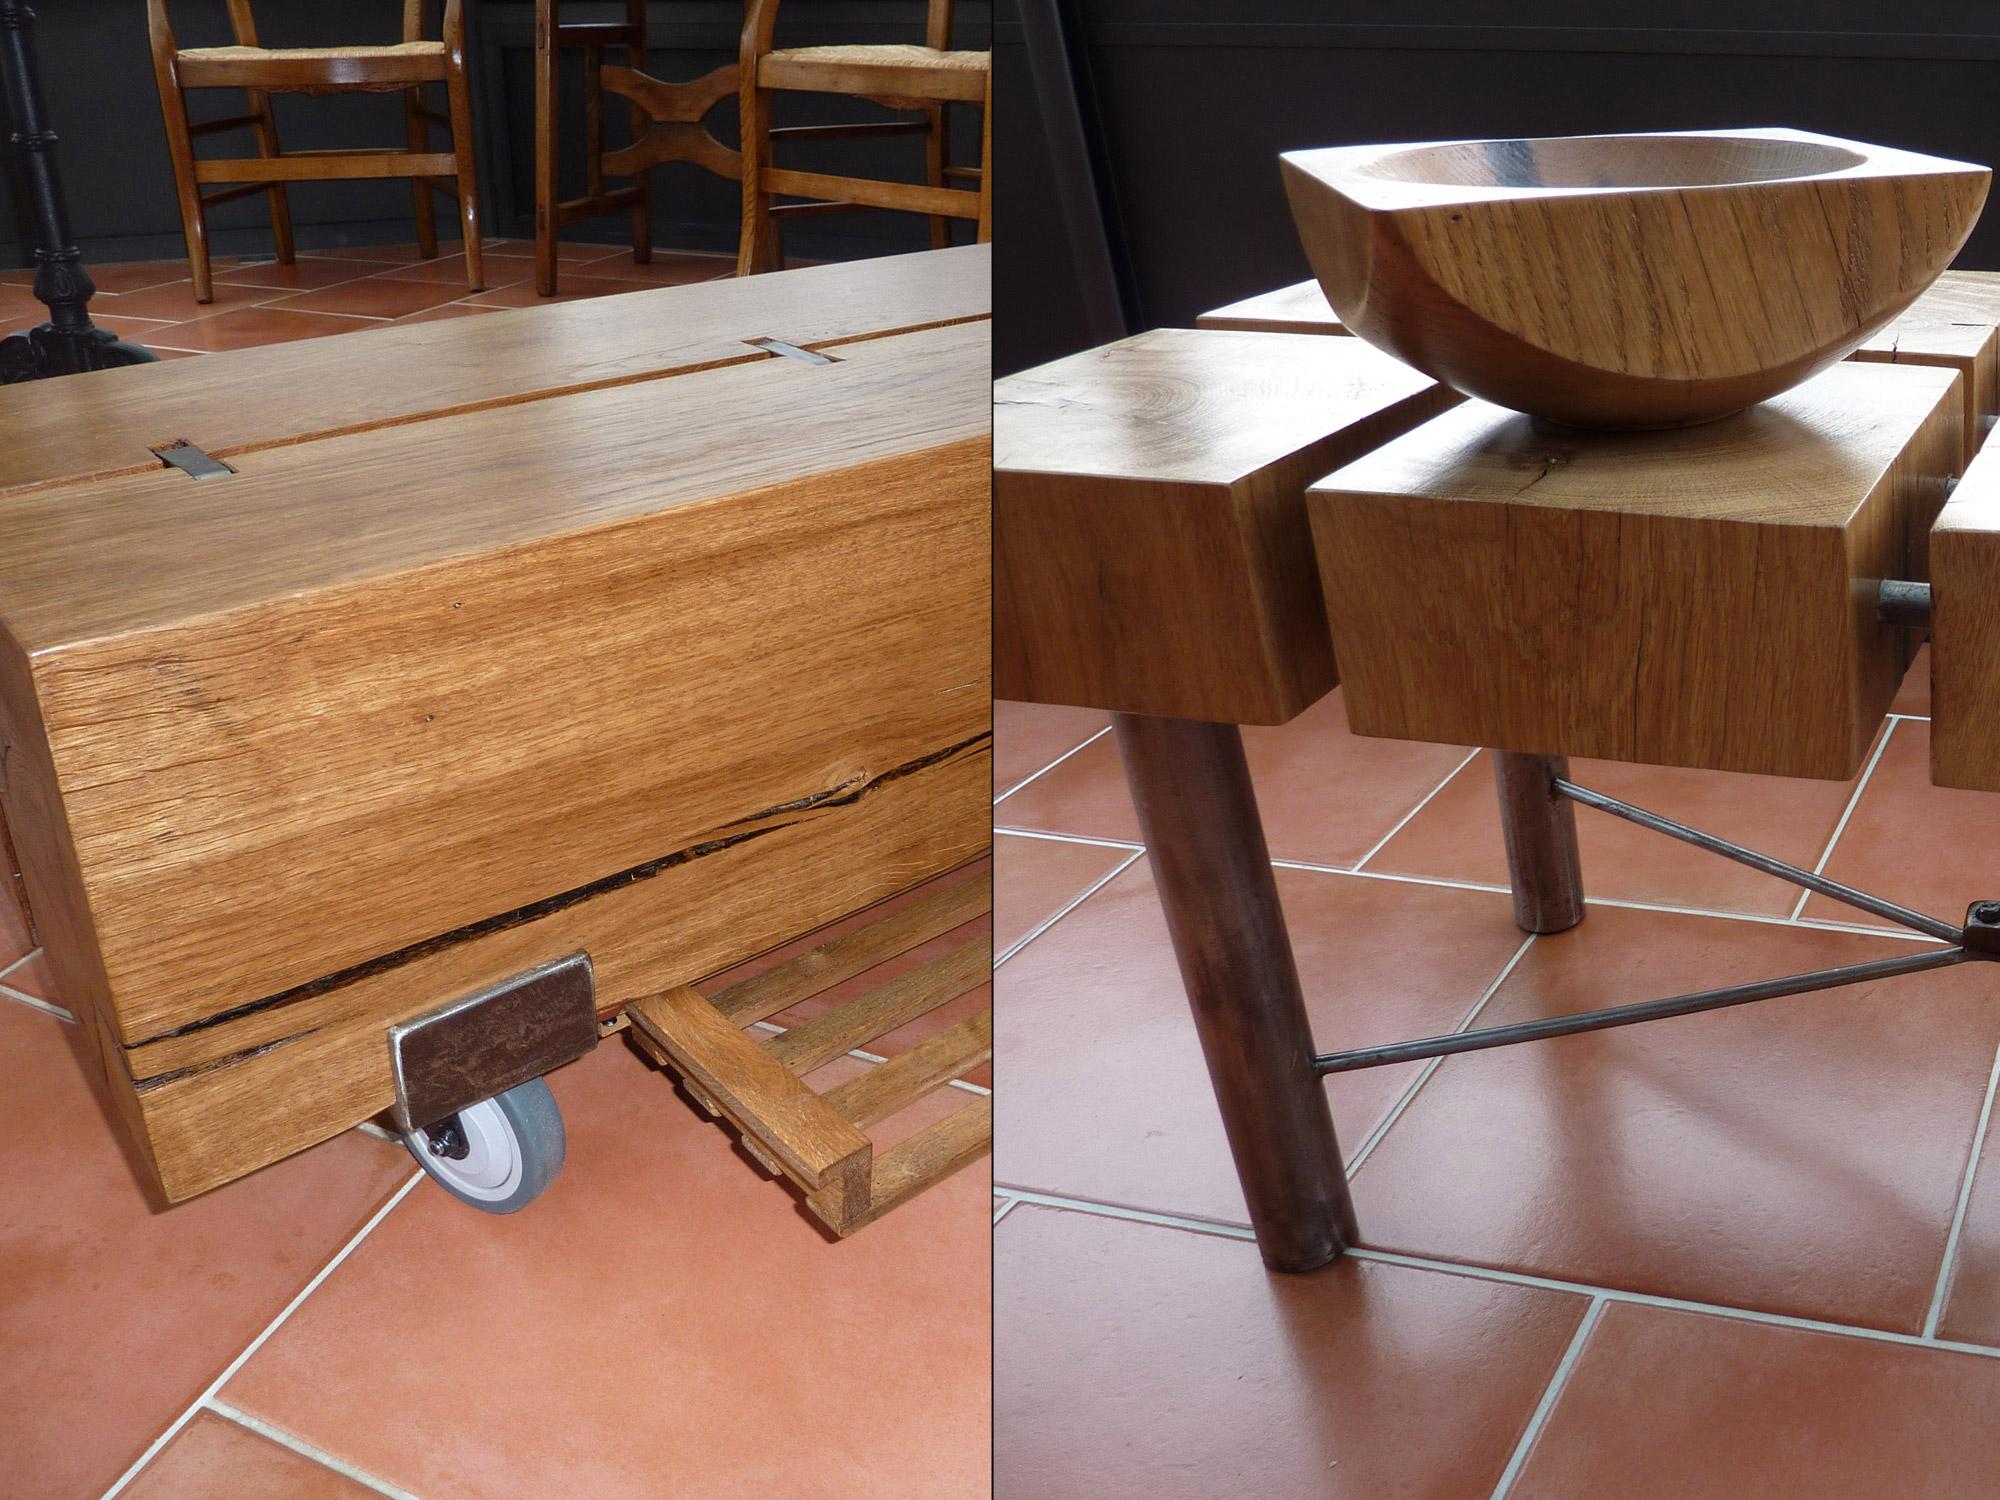 deux tables basses bois le bouvet. Black Bedroom Furniture Sets. Home Design Ideas